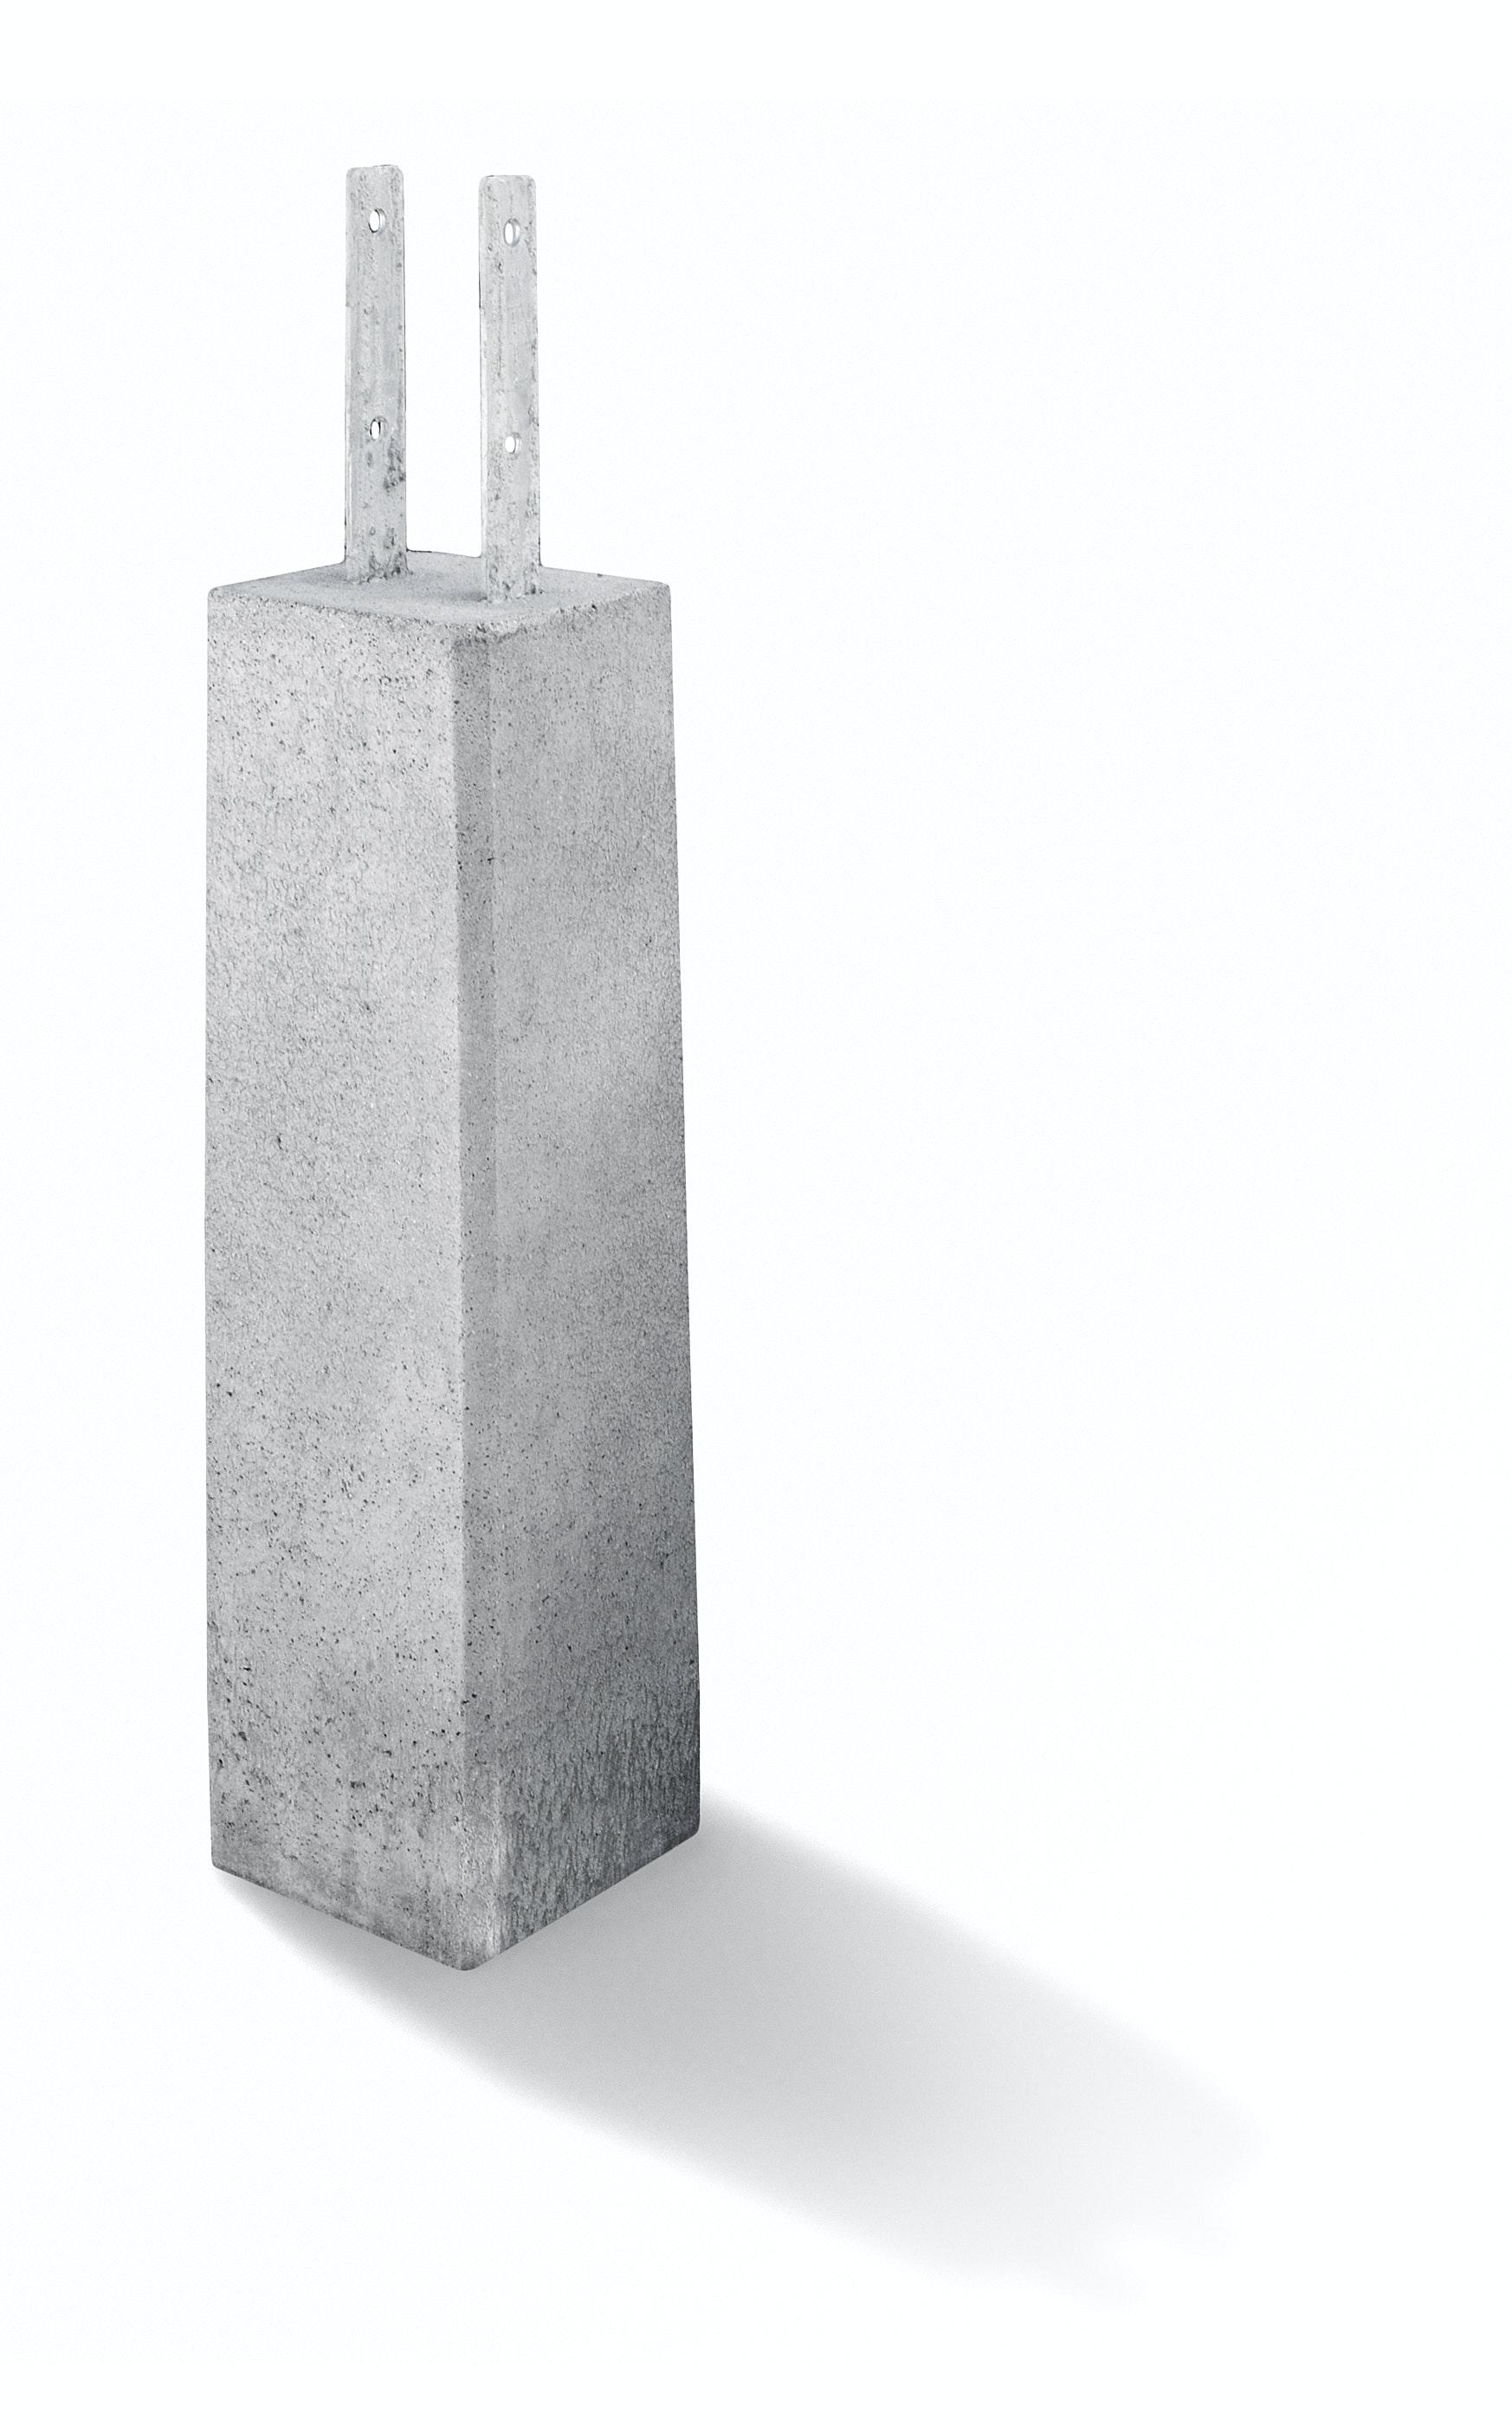 Plint S:t Eriks 75x700mm